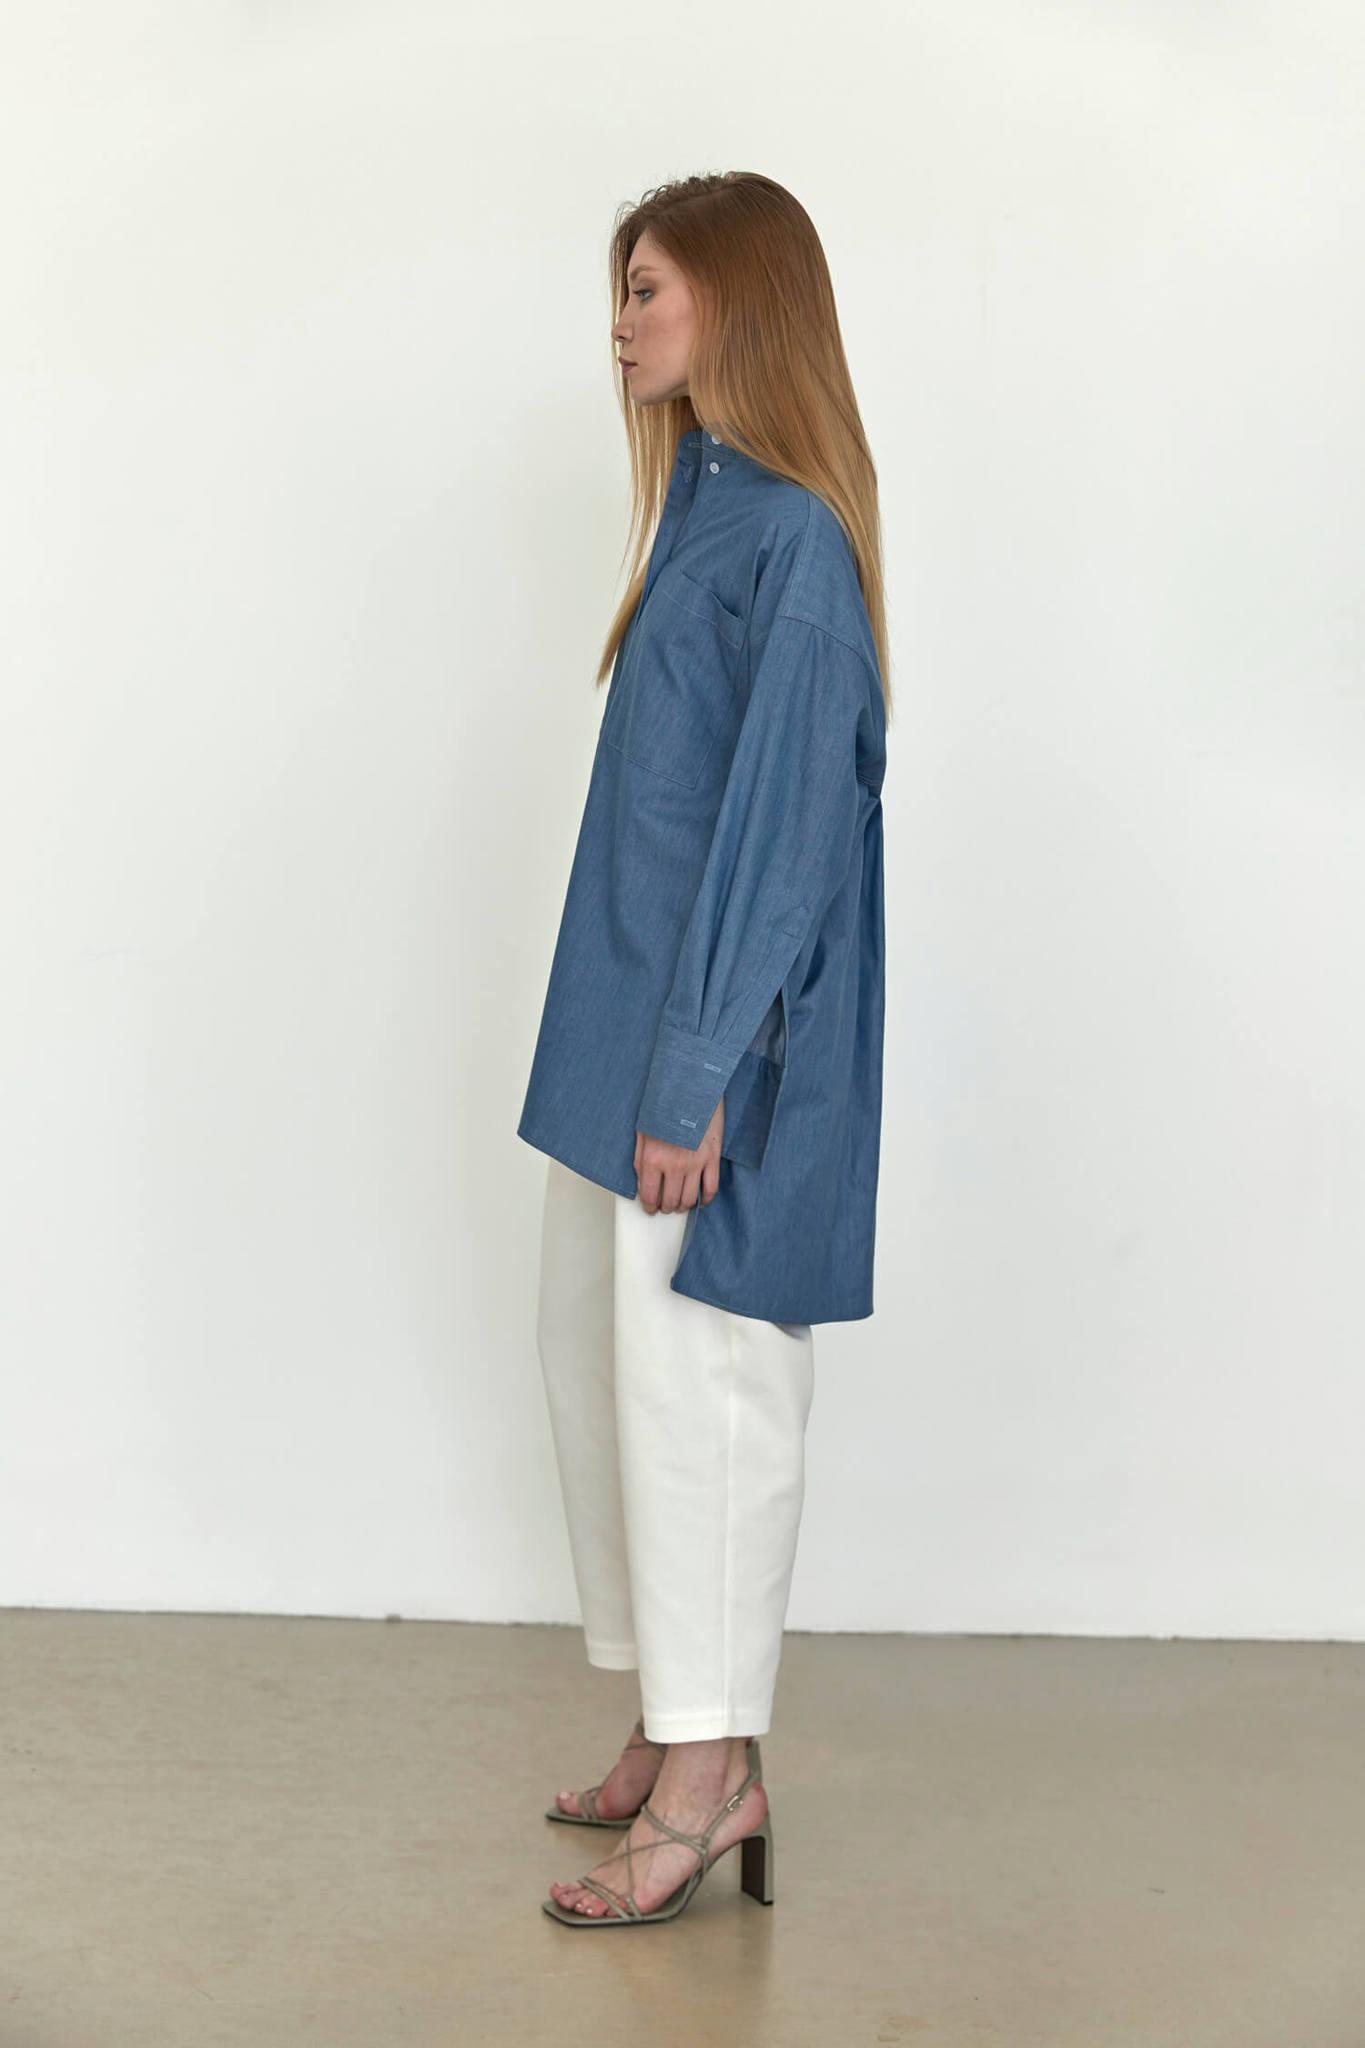 Рубашка оверсайз в мужском стиле, синий деним